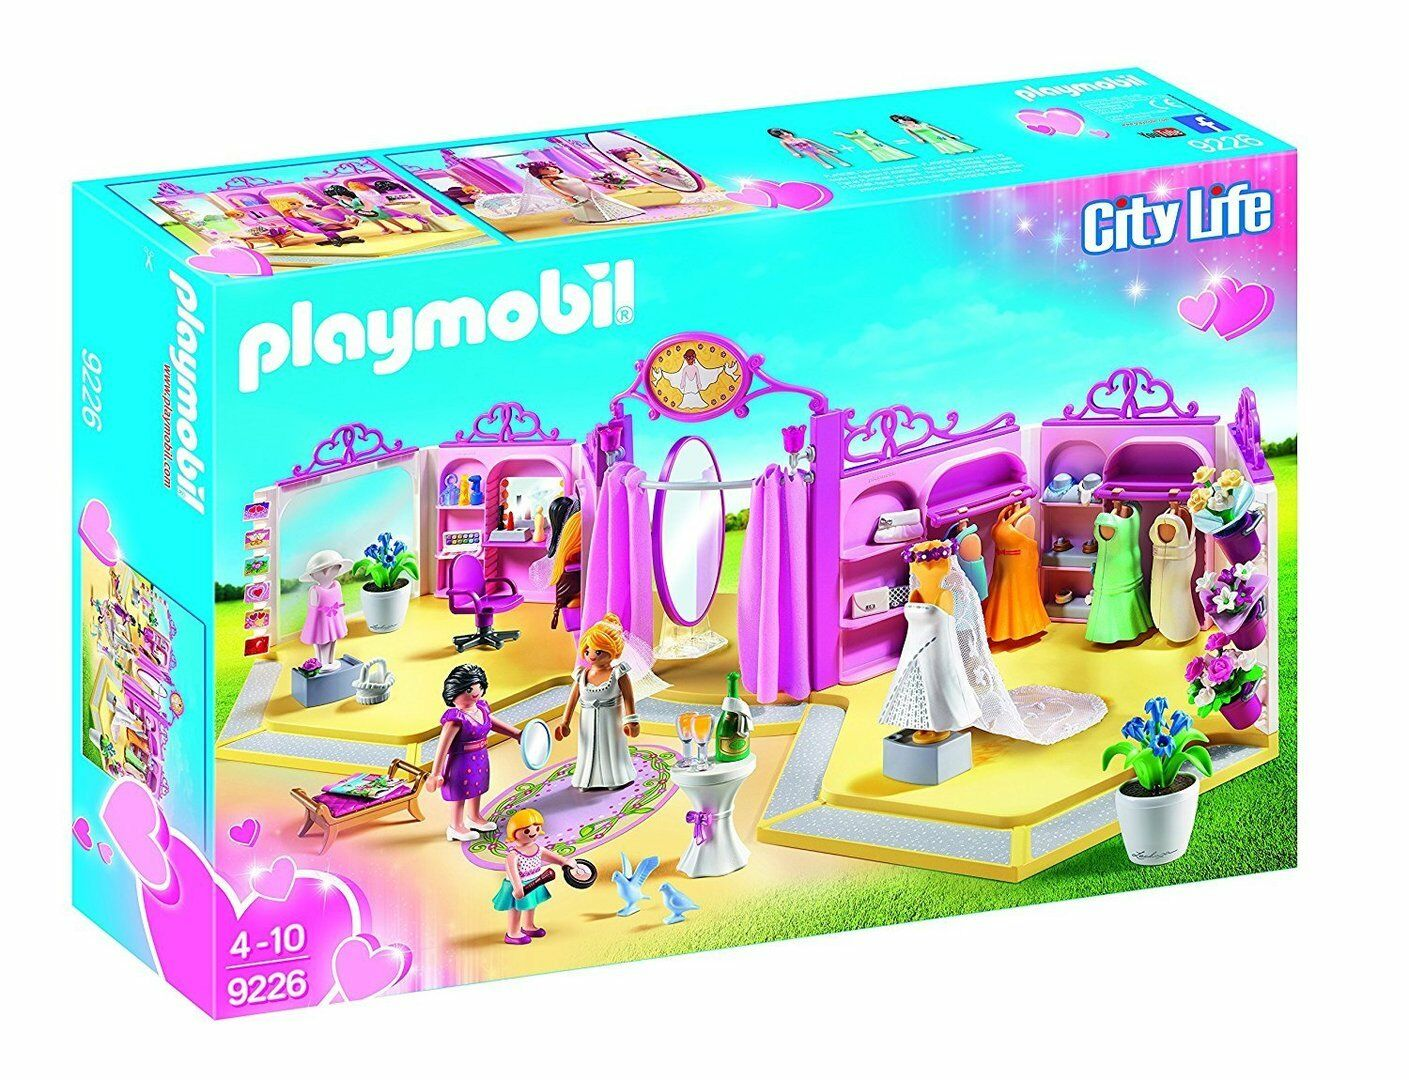 Playmobil 9226 City Life - Tienda de Novias - NUEVO